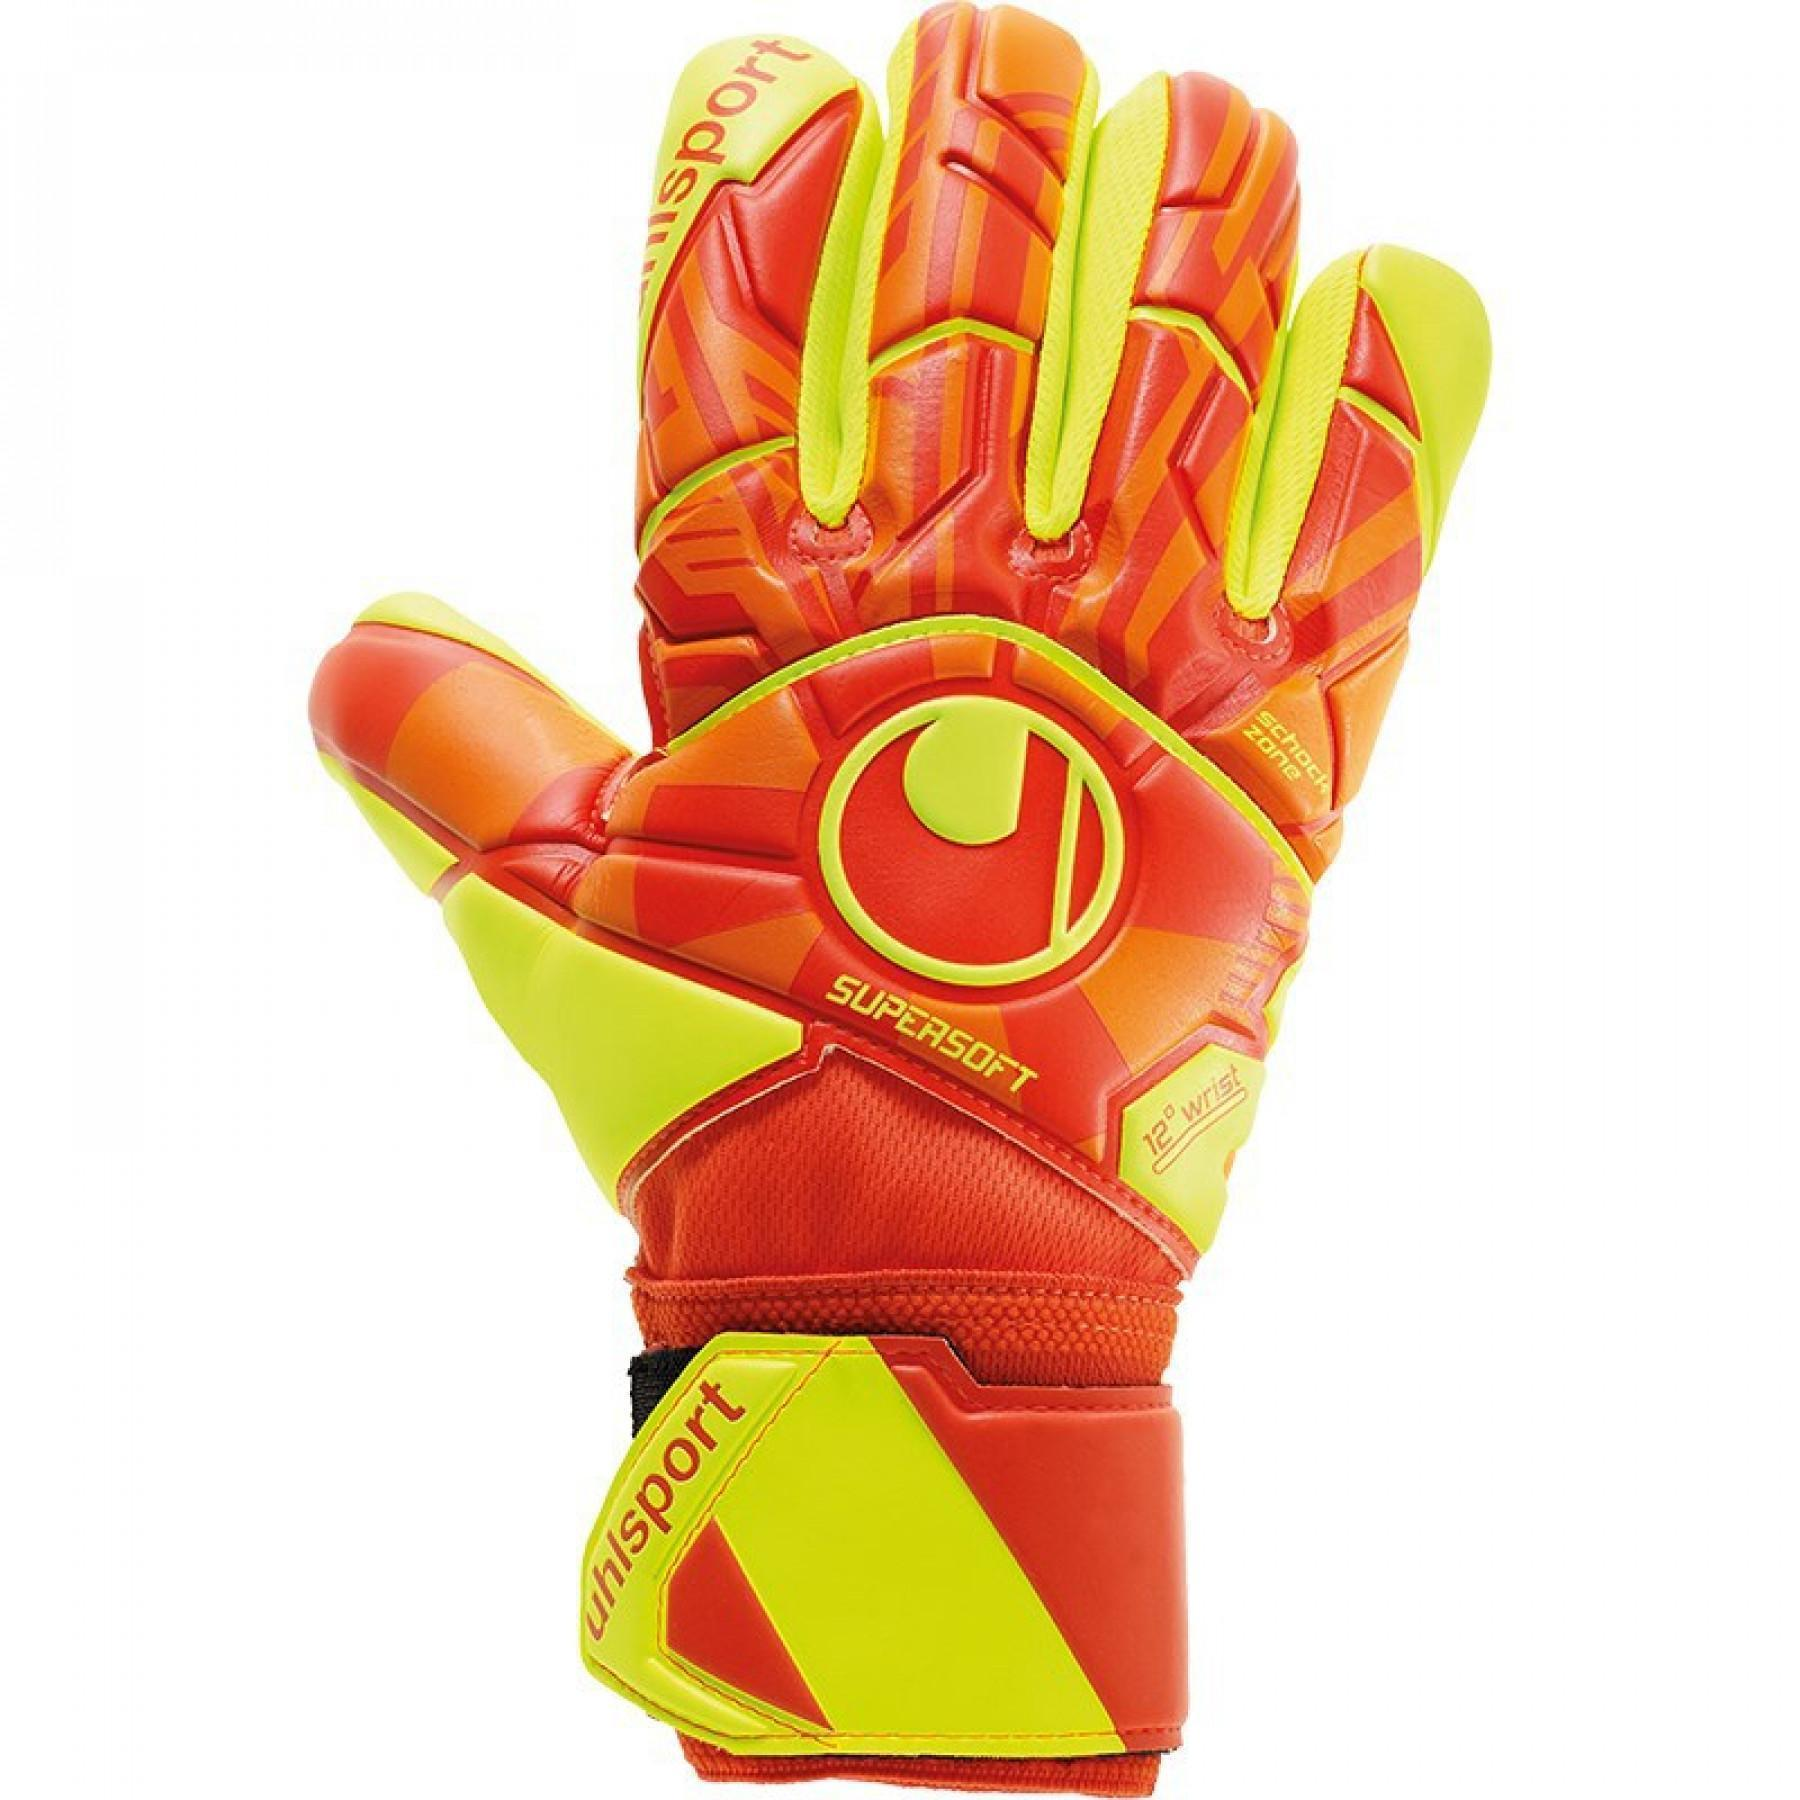 Uhlsport Dynamic Impulse Supersoft Hn goalie handschoenen